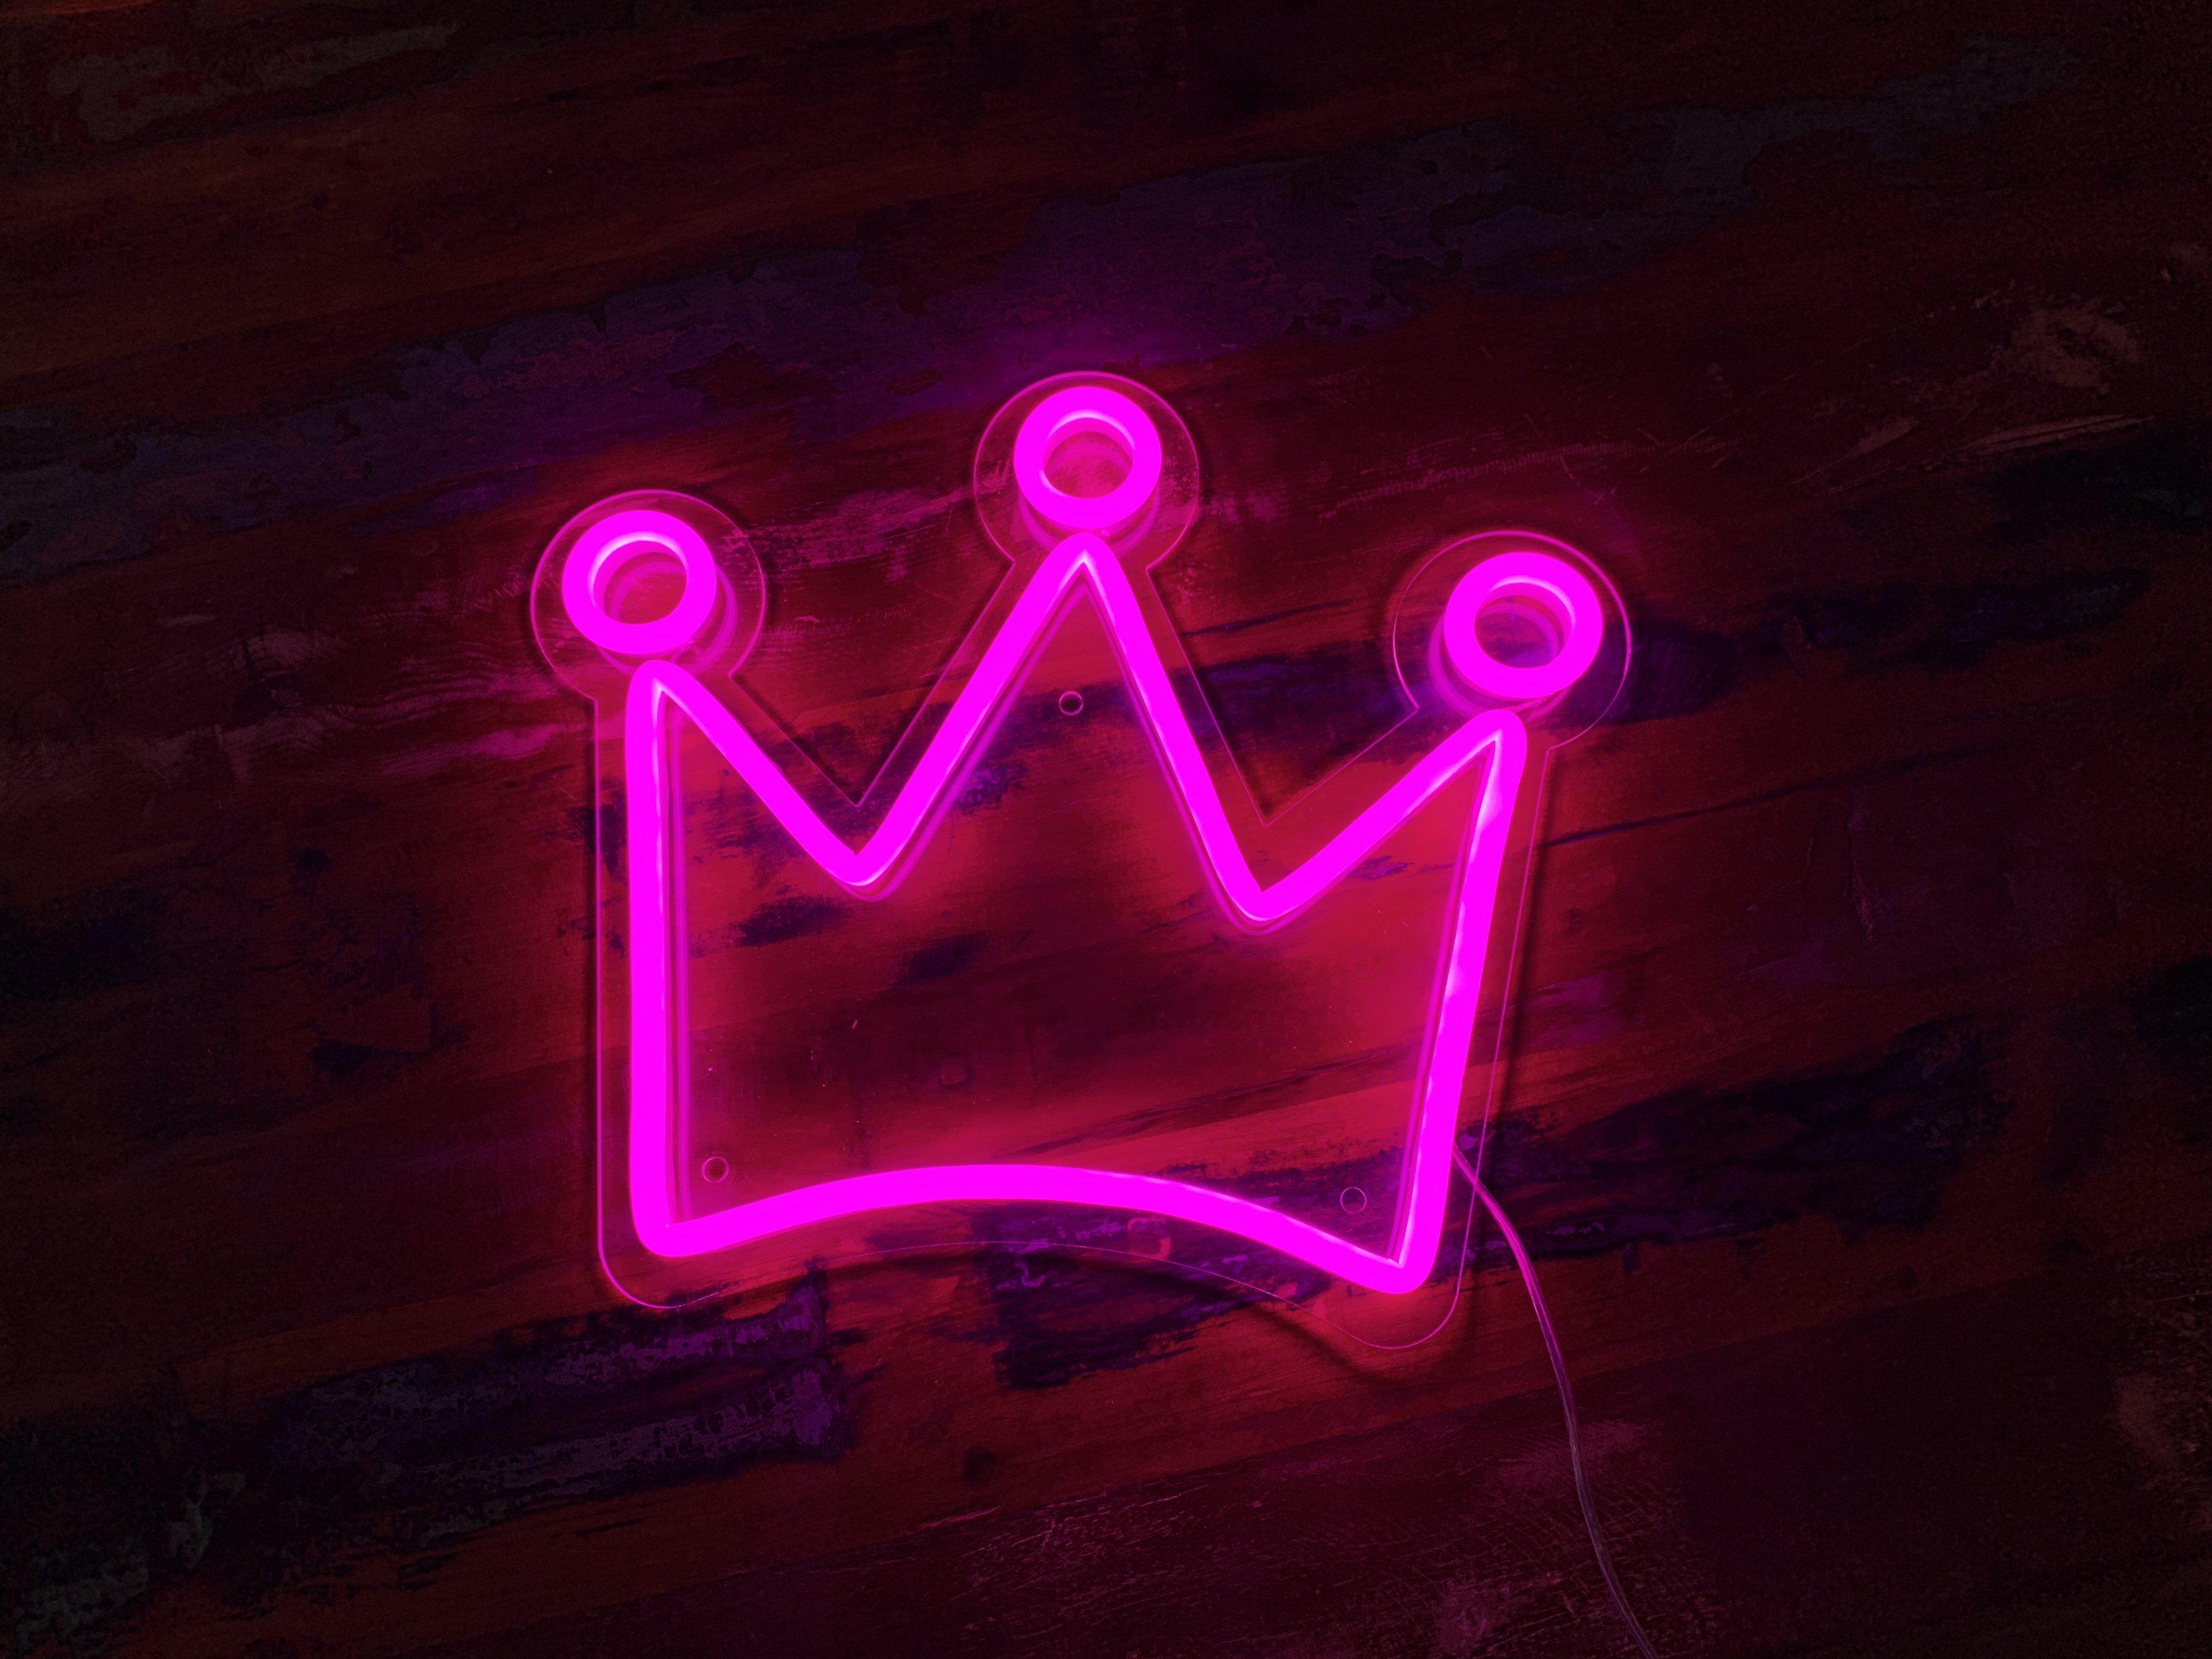 Crown LED Neon Sign Neon signs, Led neon signs, Neon